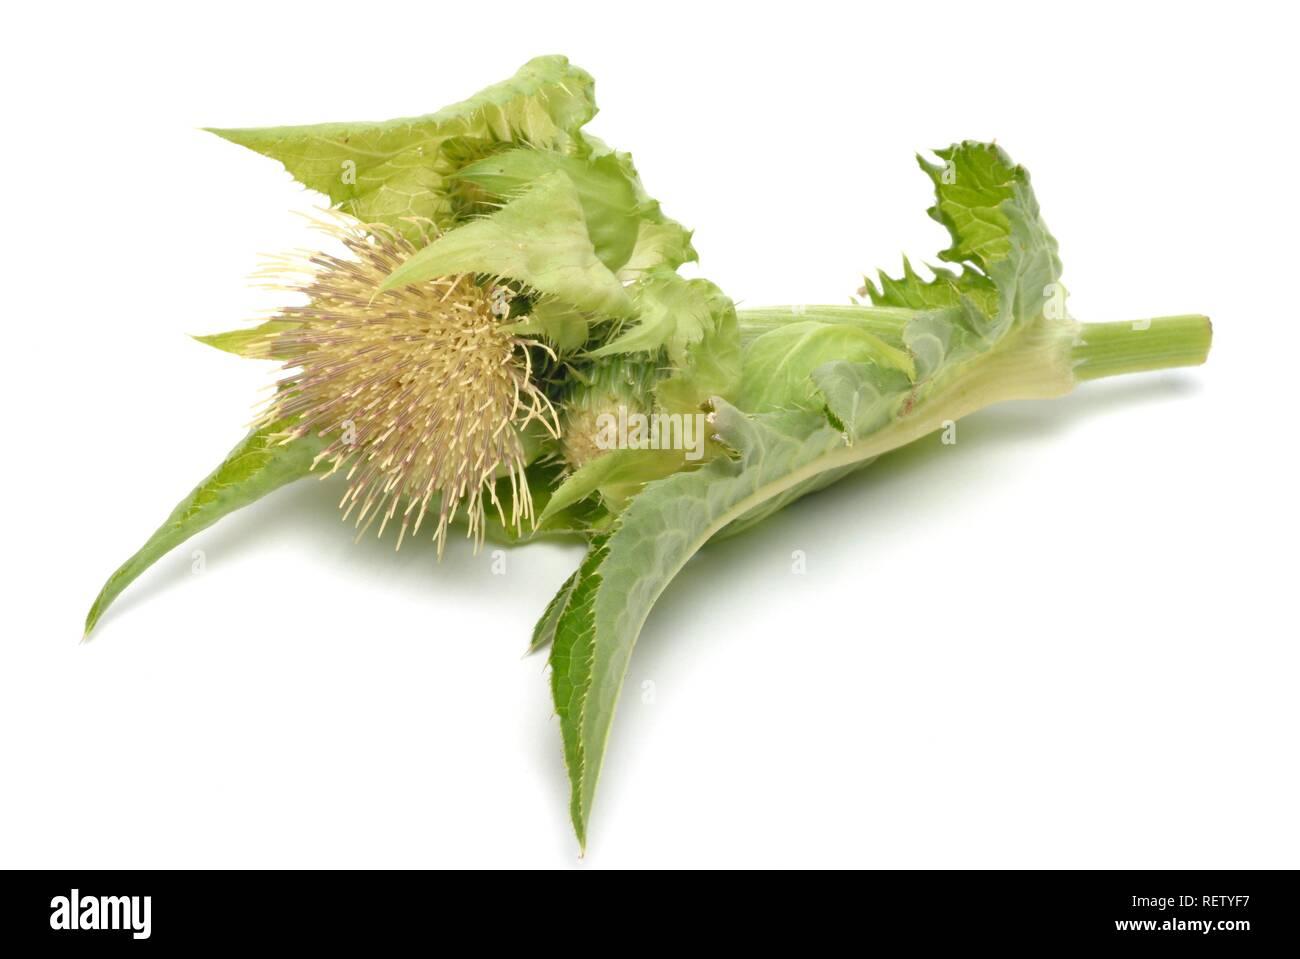 Cabbage Thistle (Cirsium oleraceum), blossom, medicinal plant - Stock Image